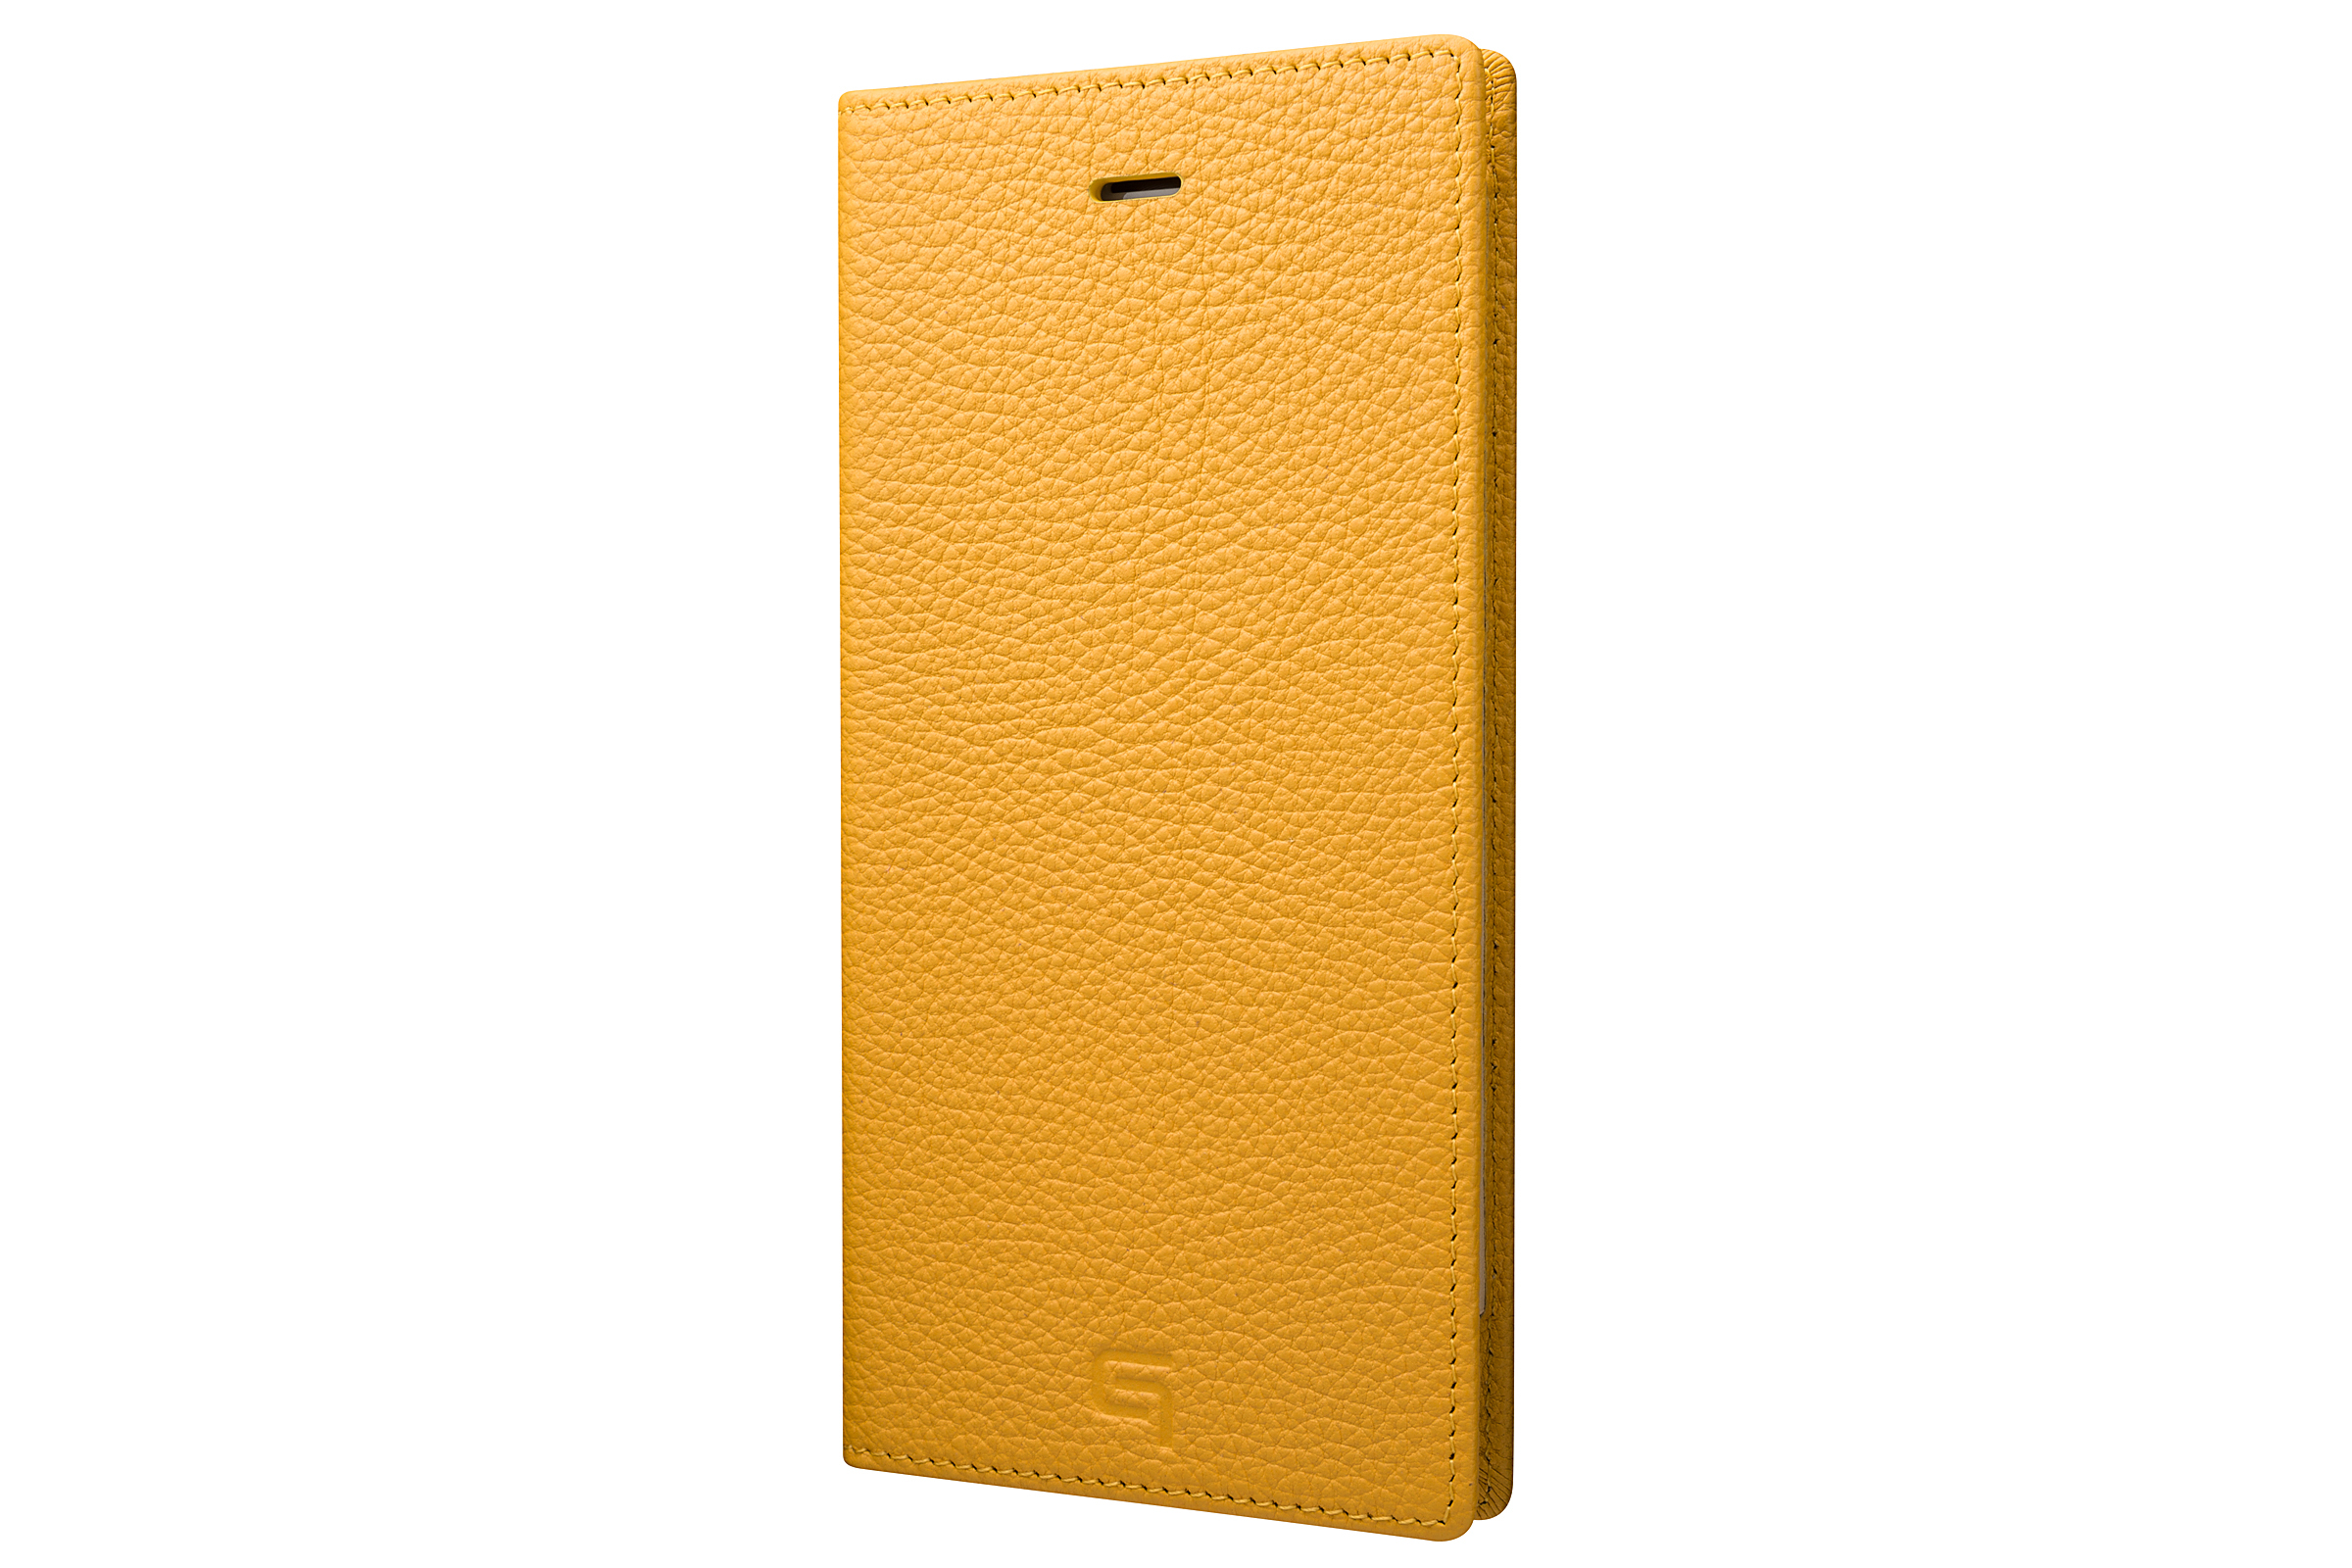 GRAMAS Shrunken-calf Full Leather Case for iPhone 7 Plus(Yellow) シュランケンカーフ 手帳型フルレザーケース - 画像1